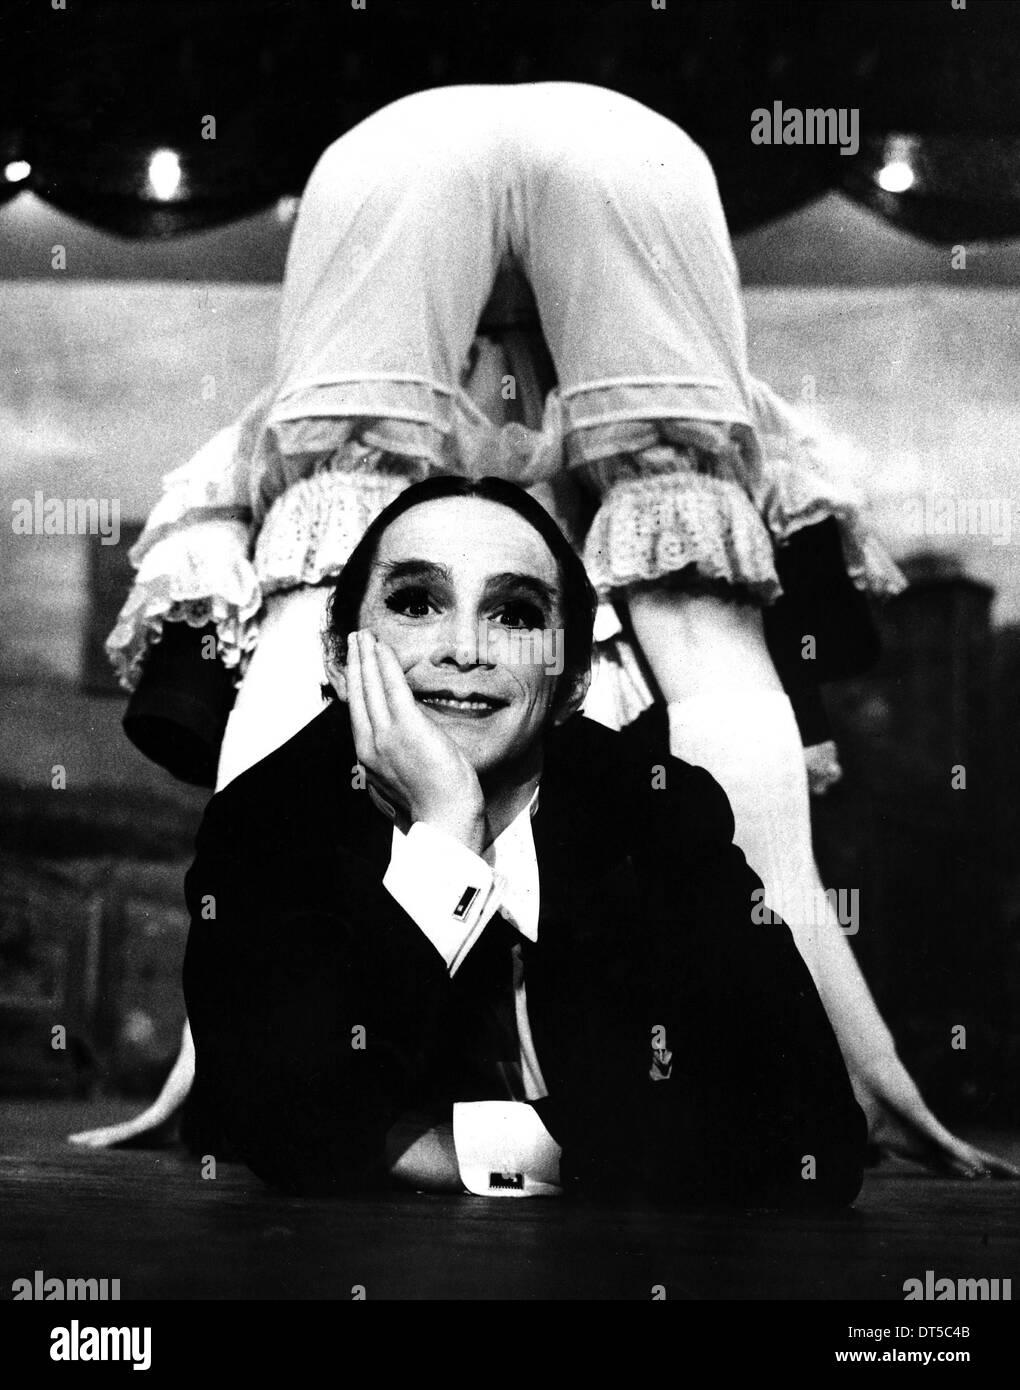 JOEL GREY CABARET (1972) - Stock Image